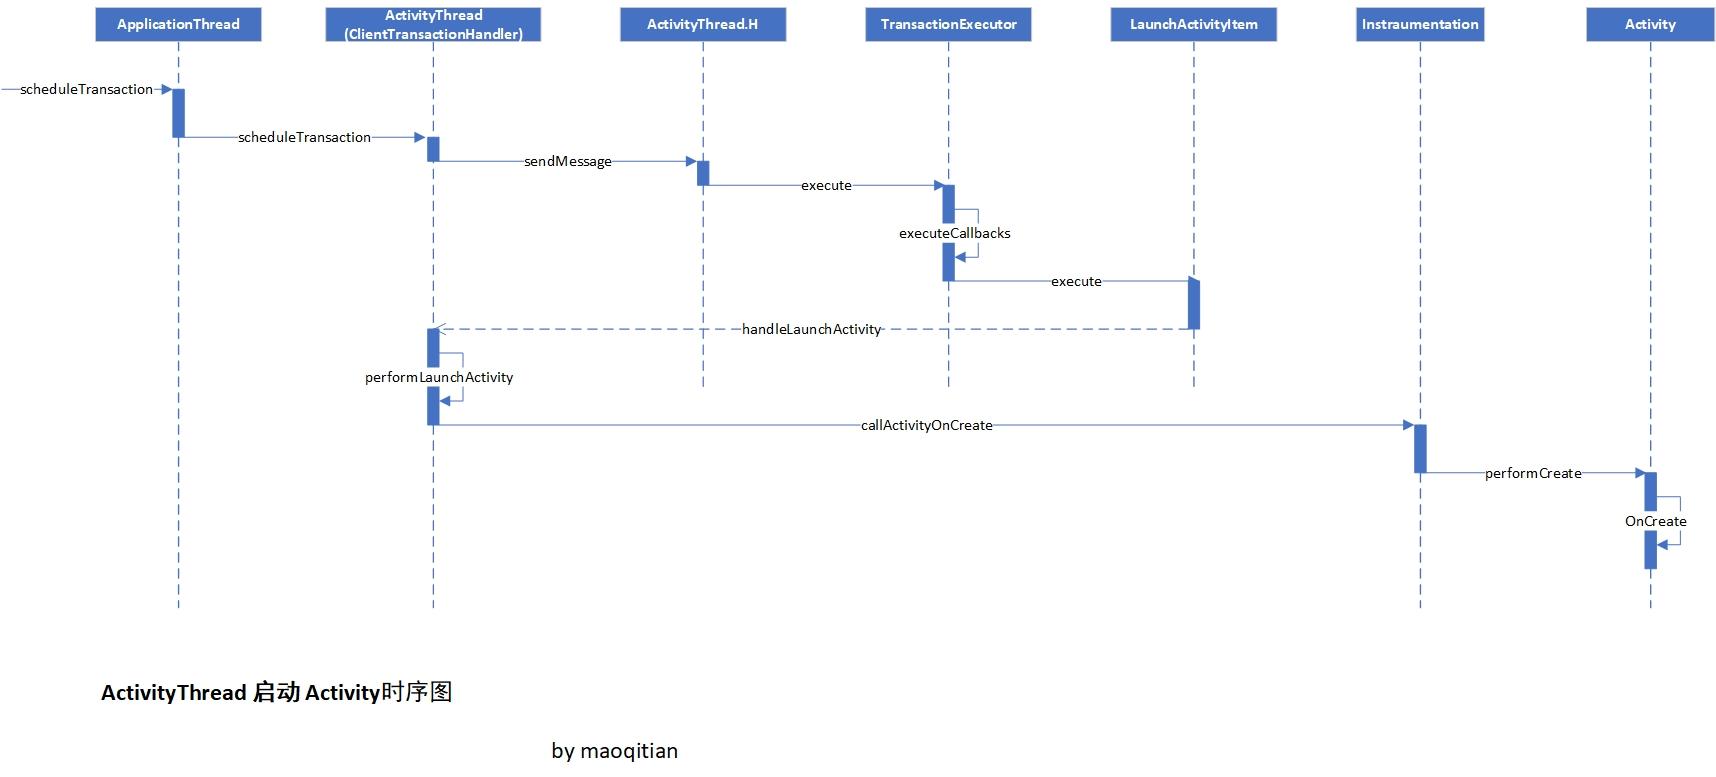 ActivityThread启动Activity的时序图